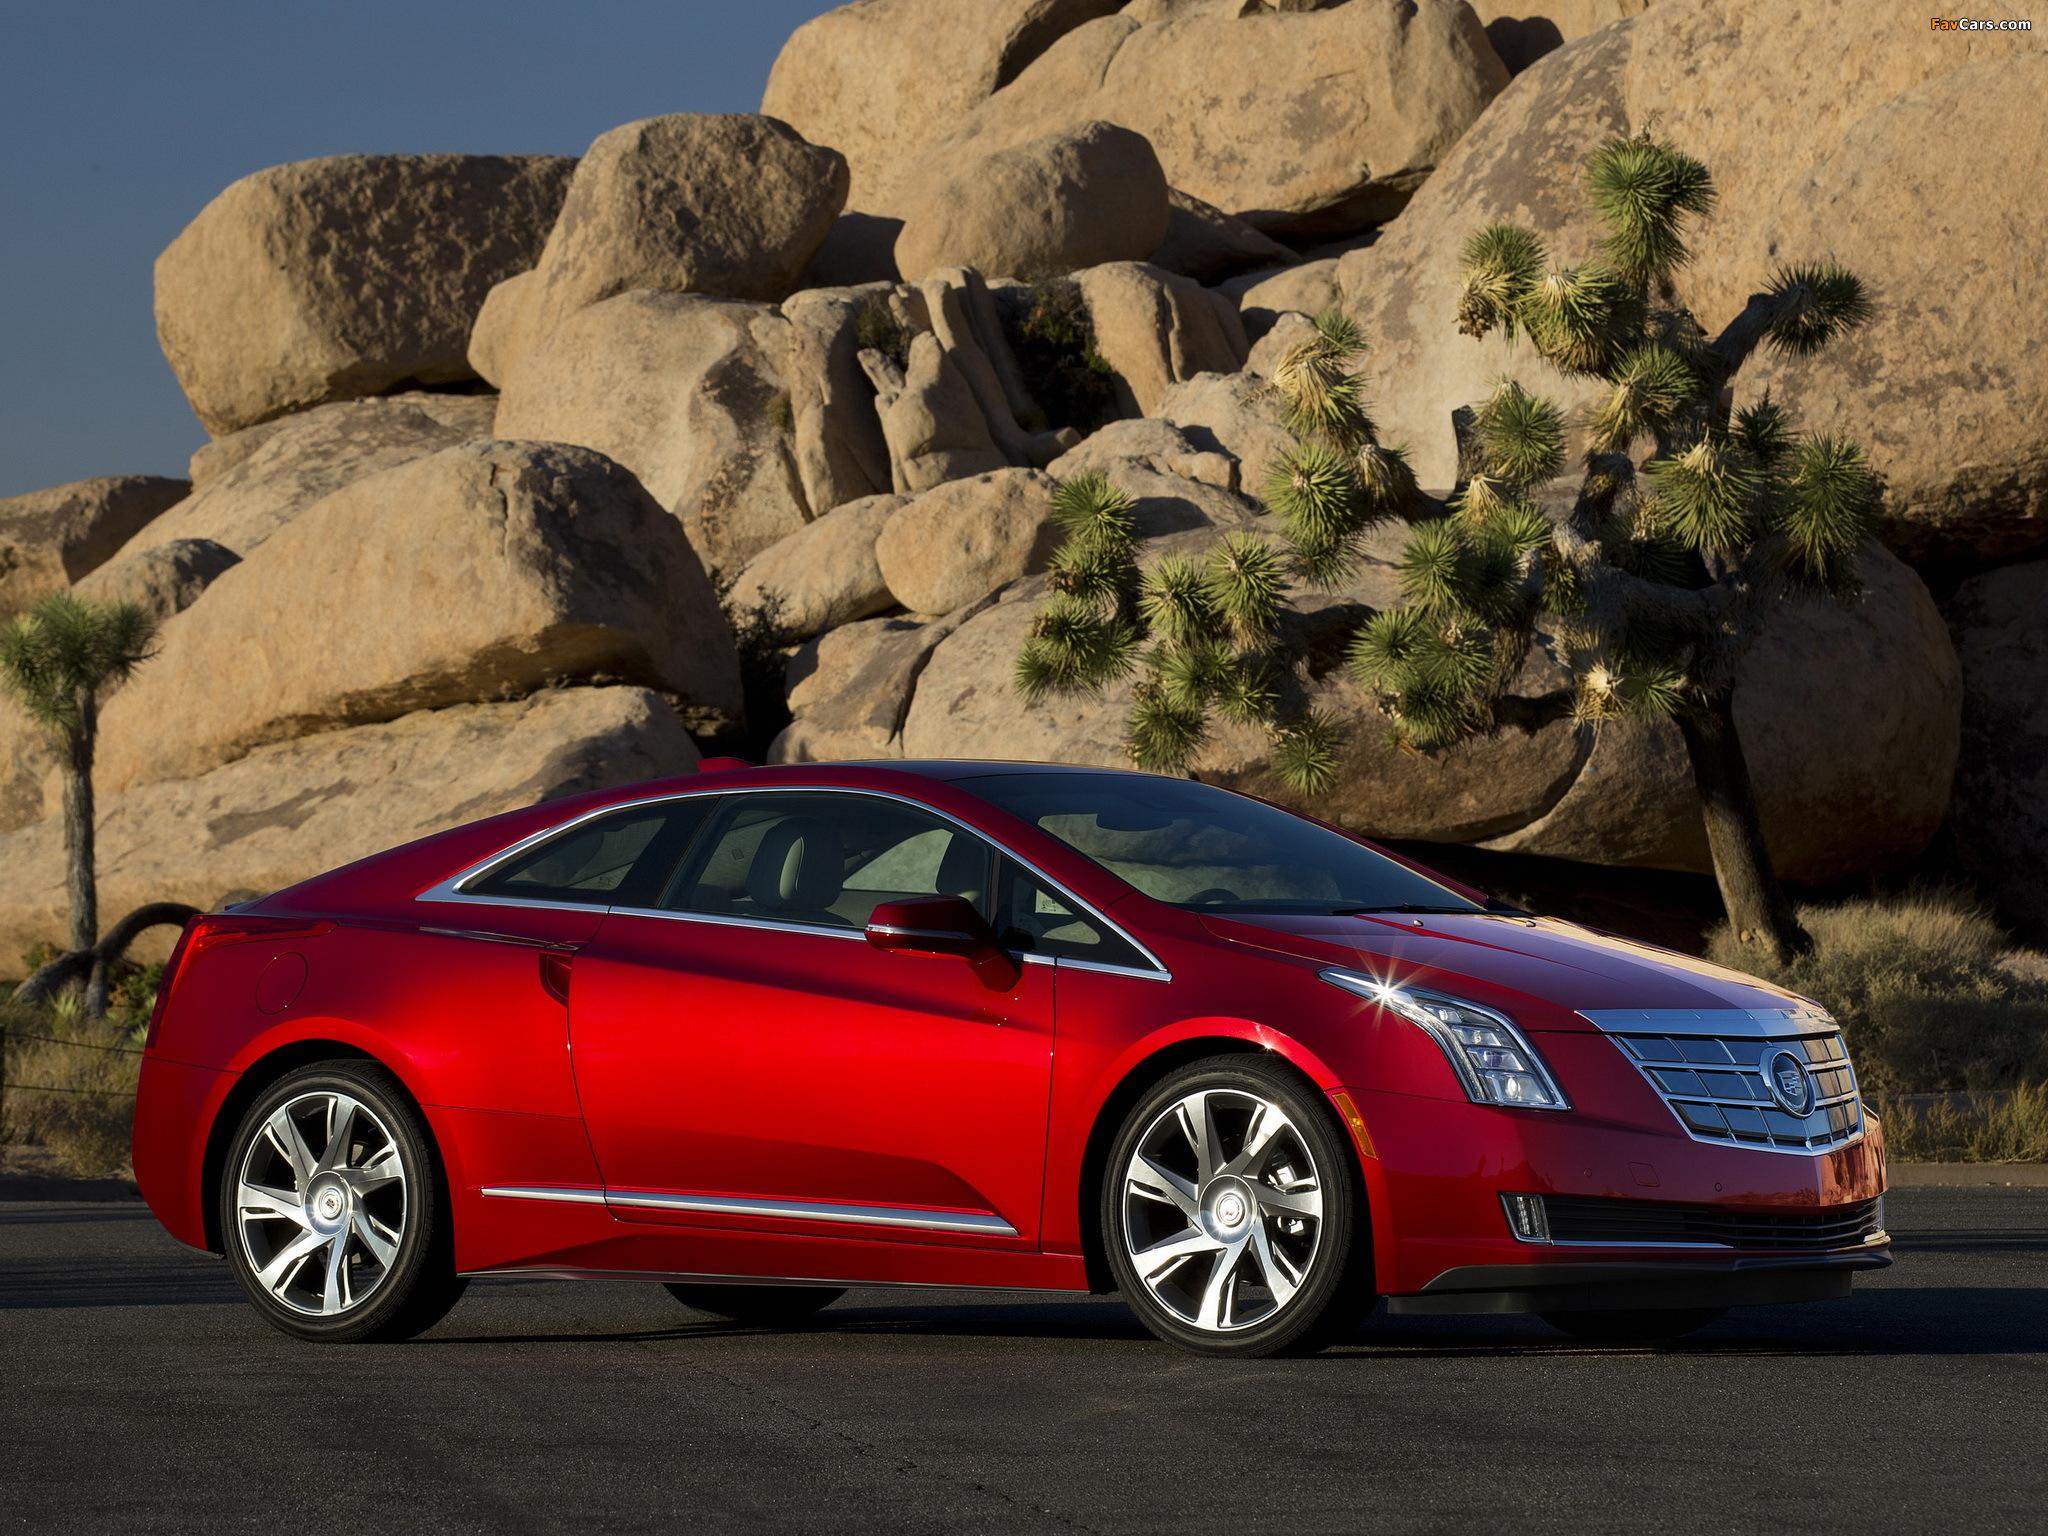 Cadillac ELR 2014 images (2048 x 1536)